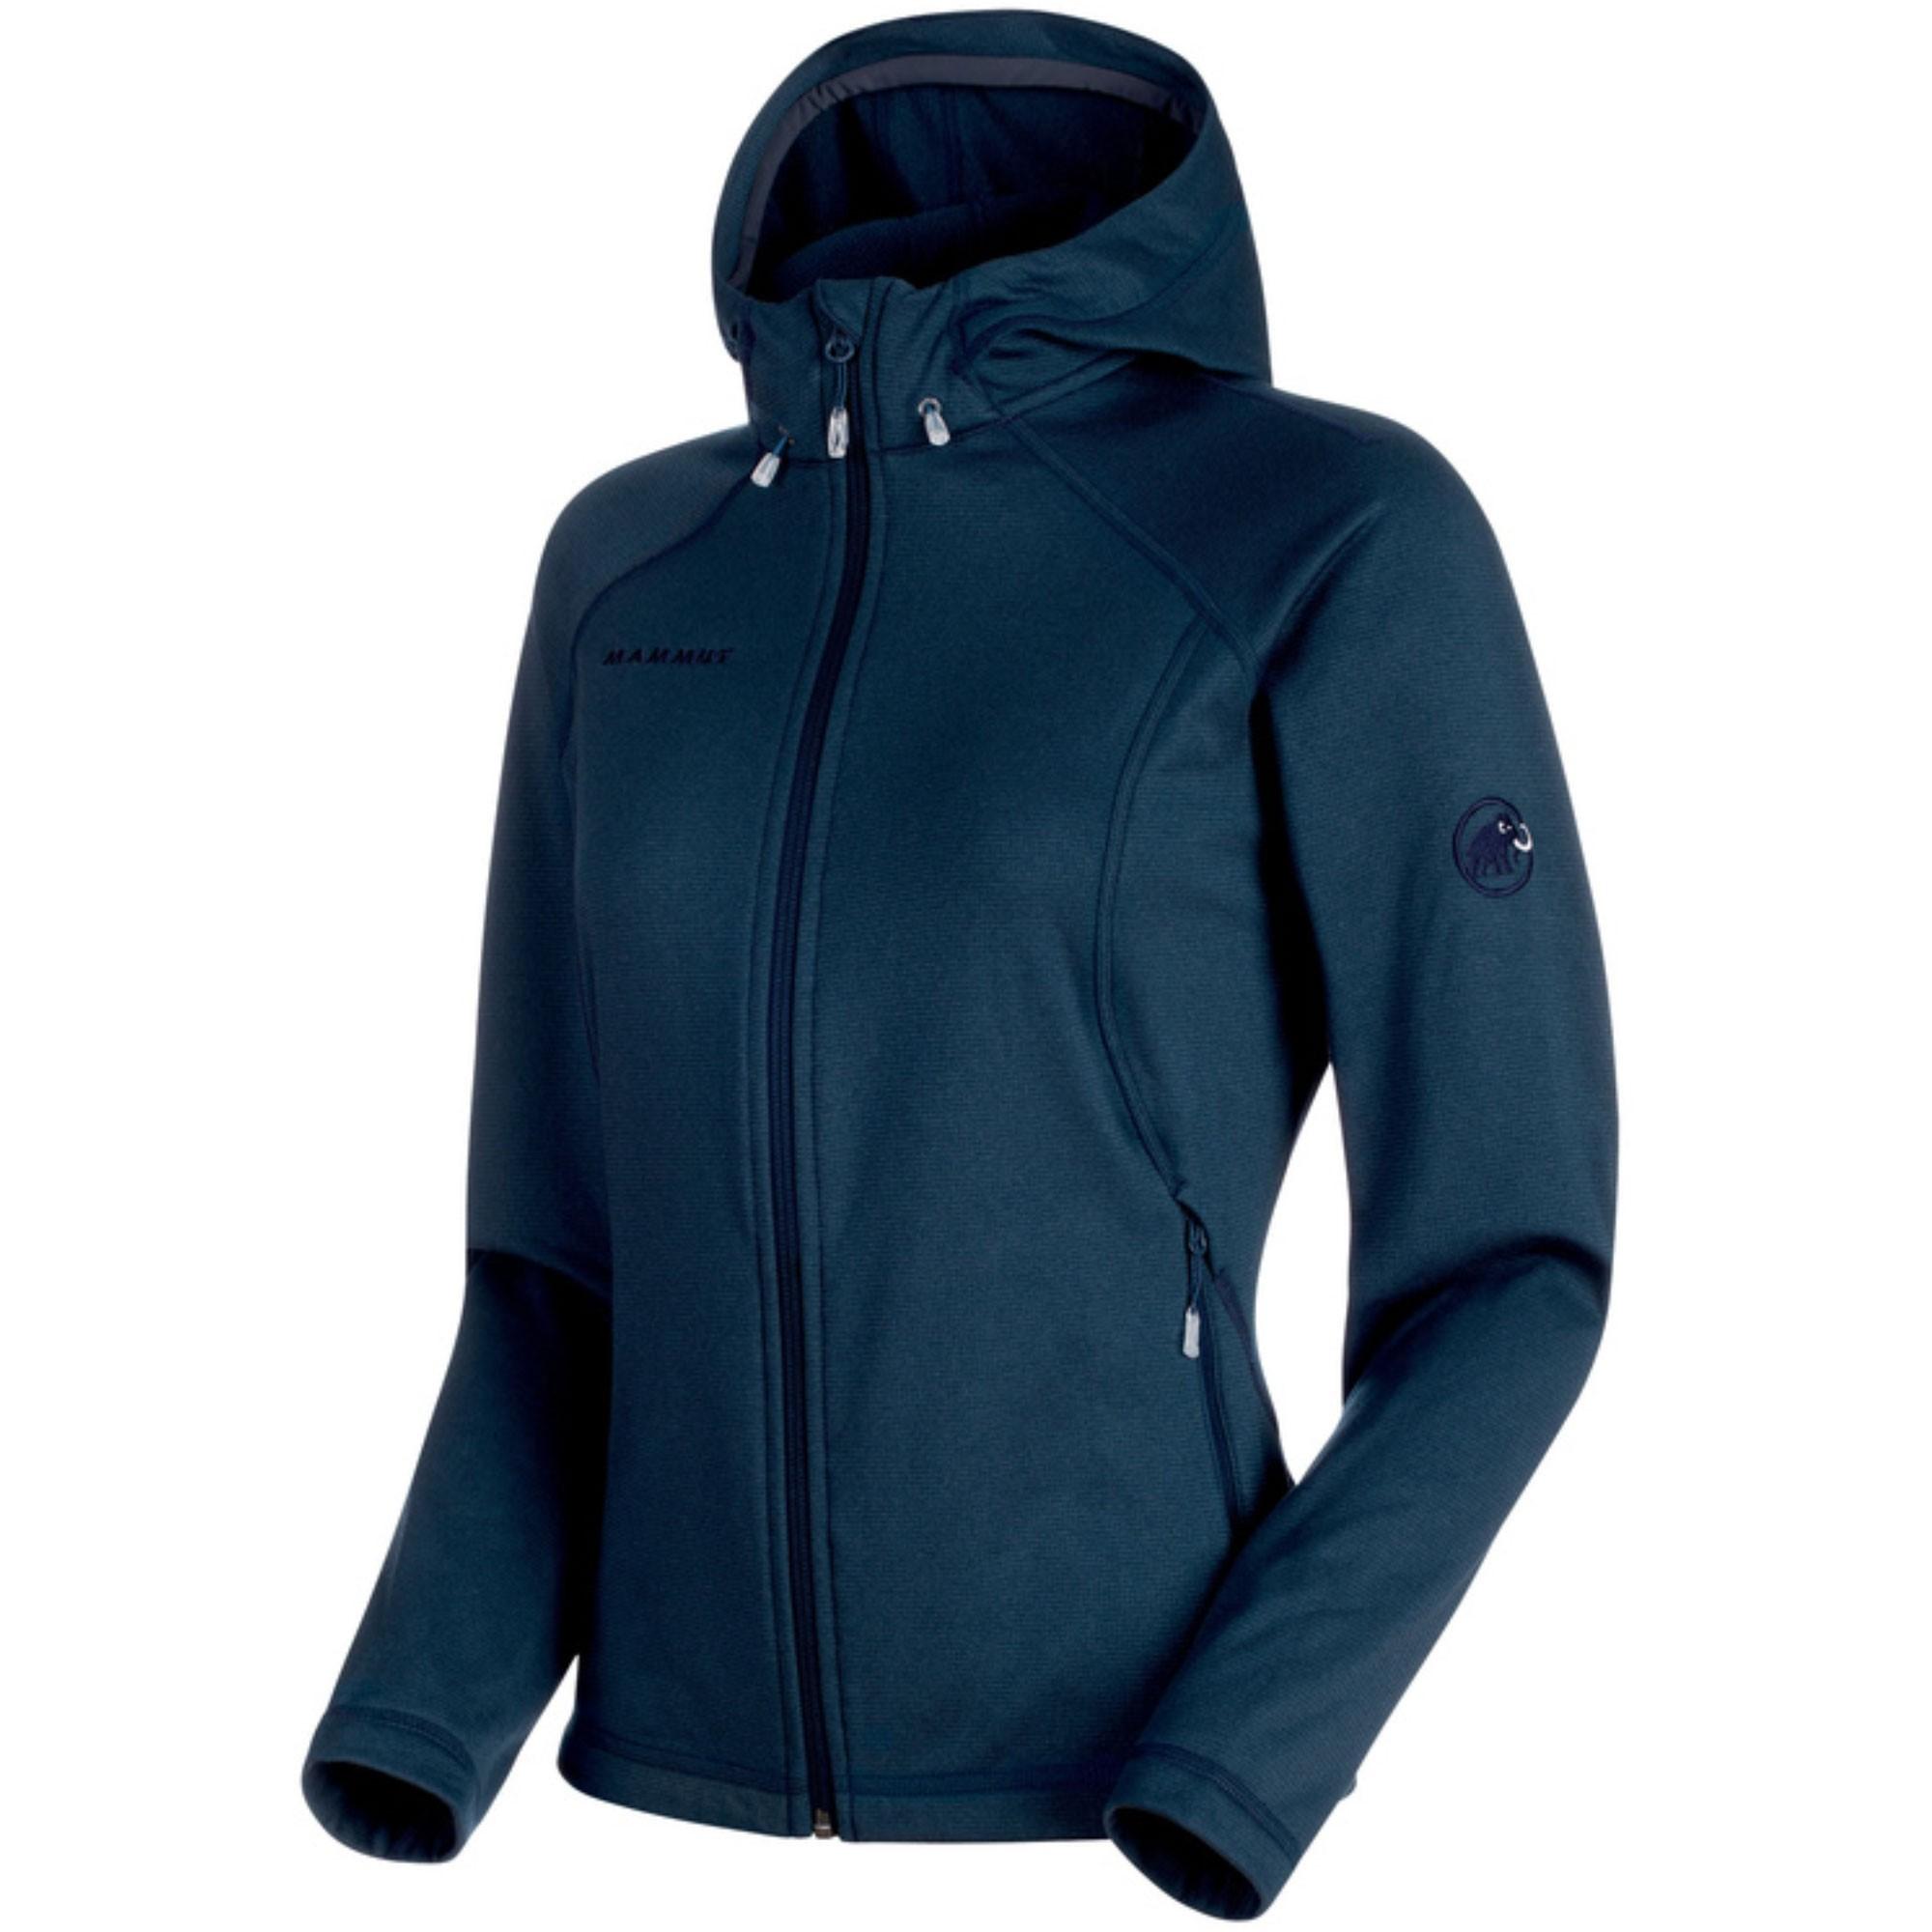 Mammut Runbold ML Women's Hooded Fleece Jacket - Marine Dark Melange